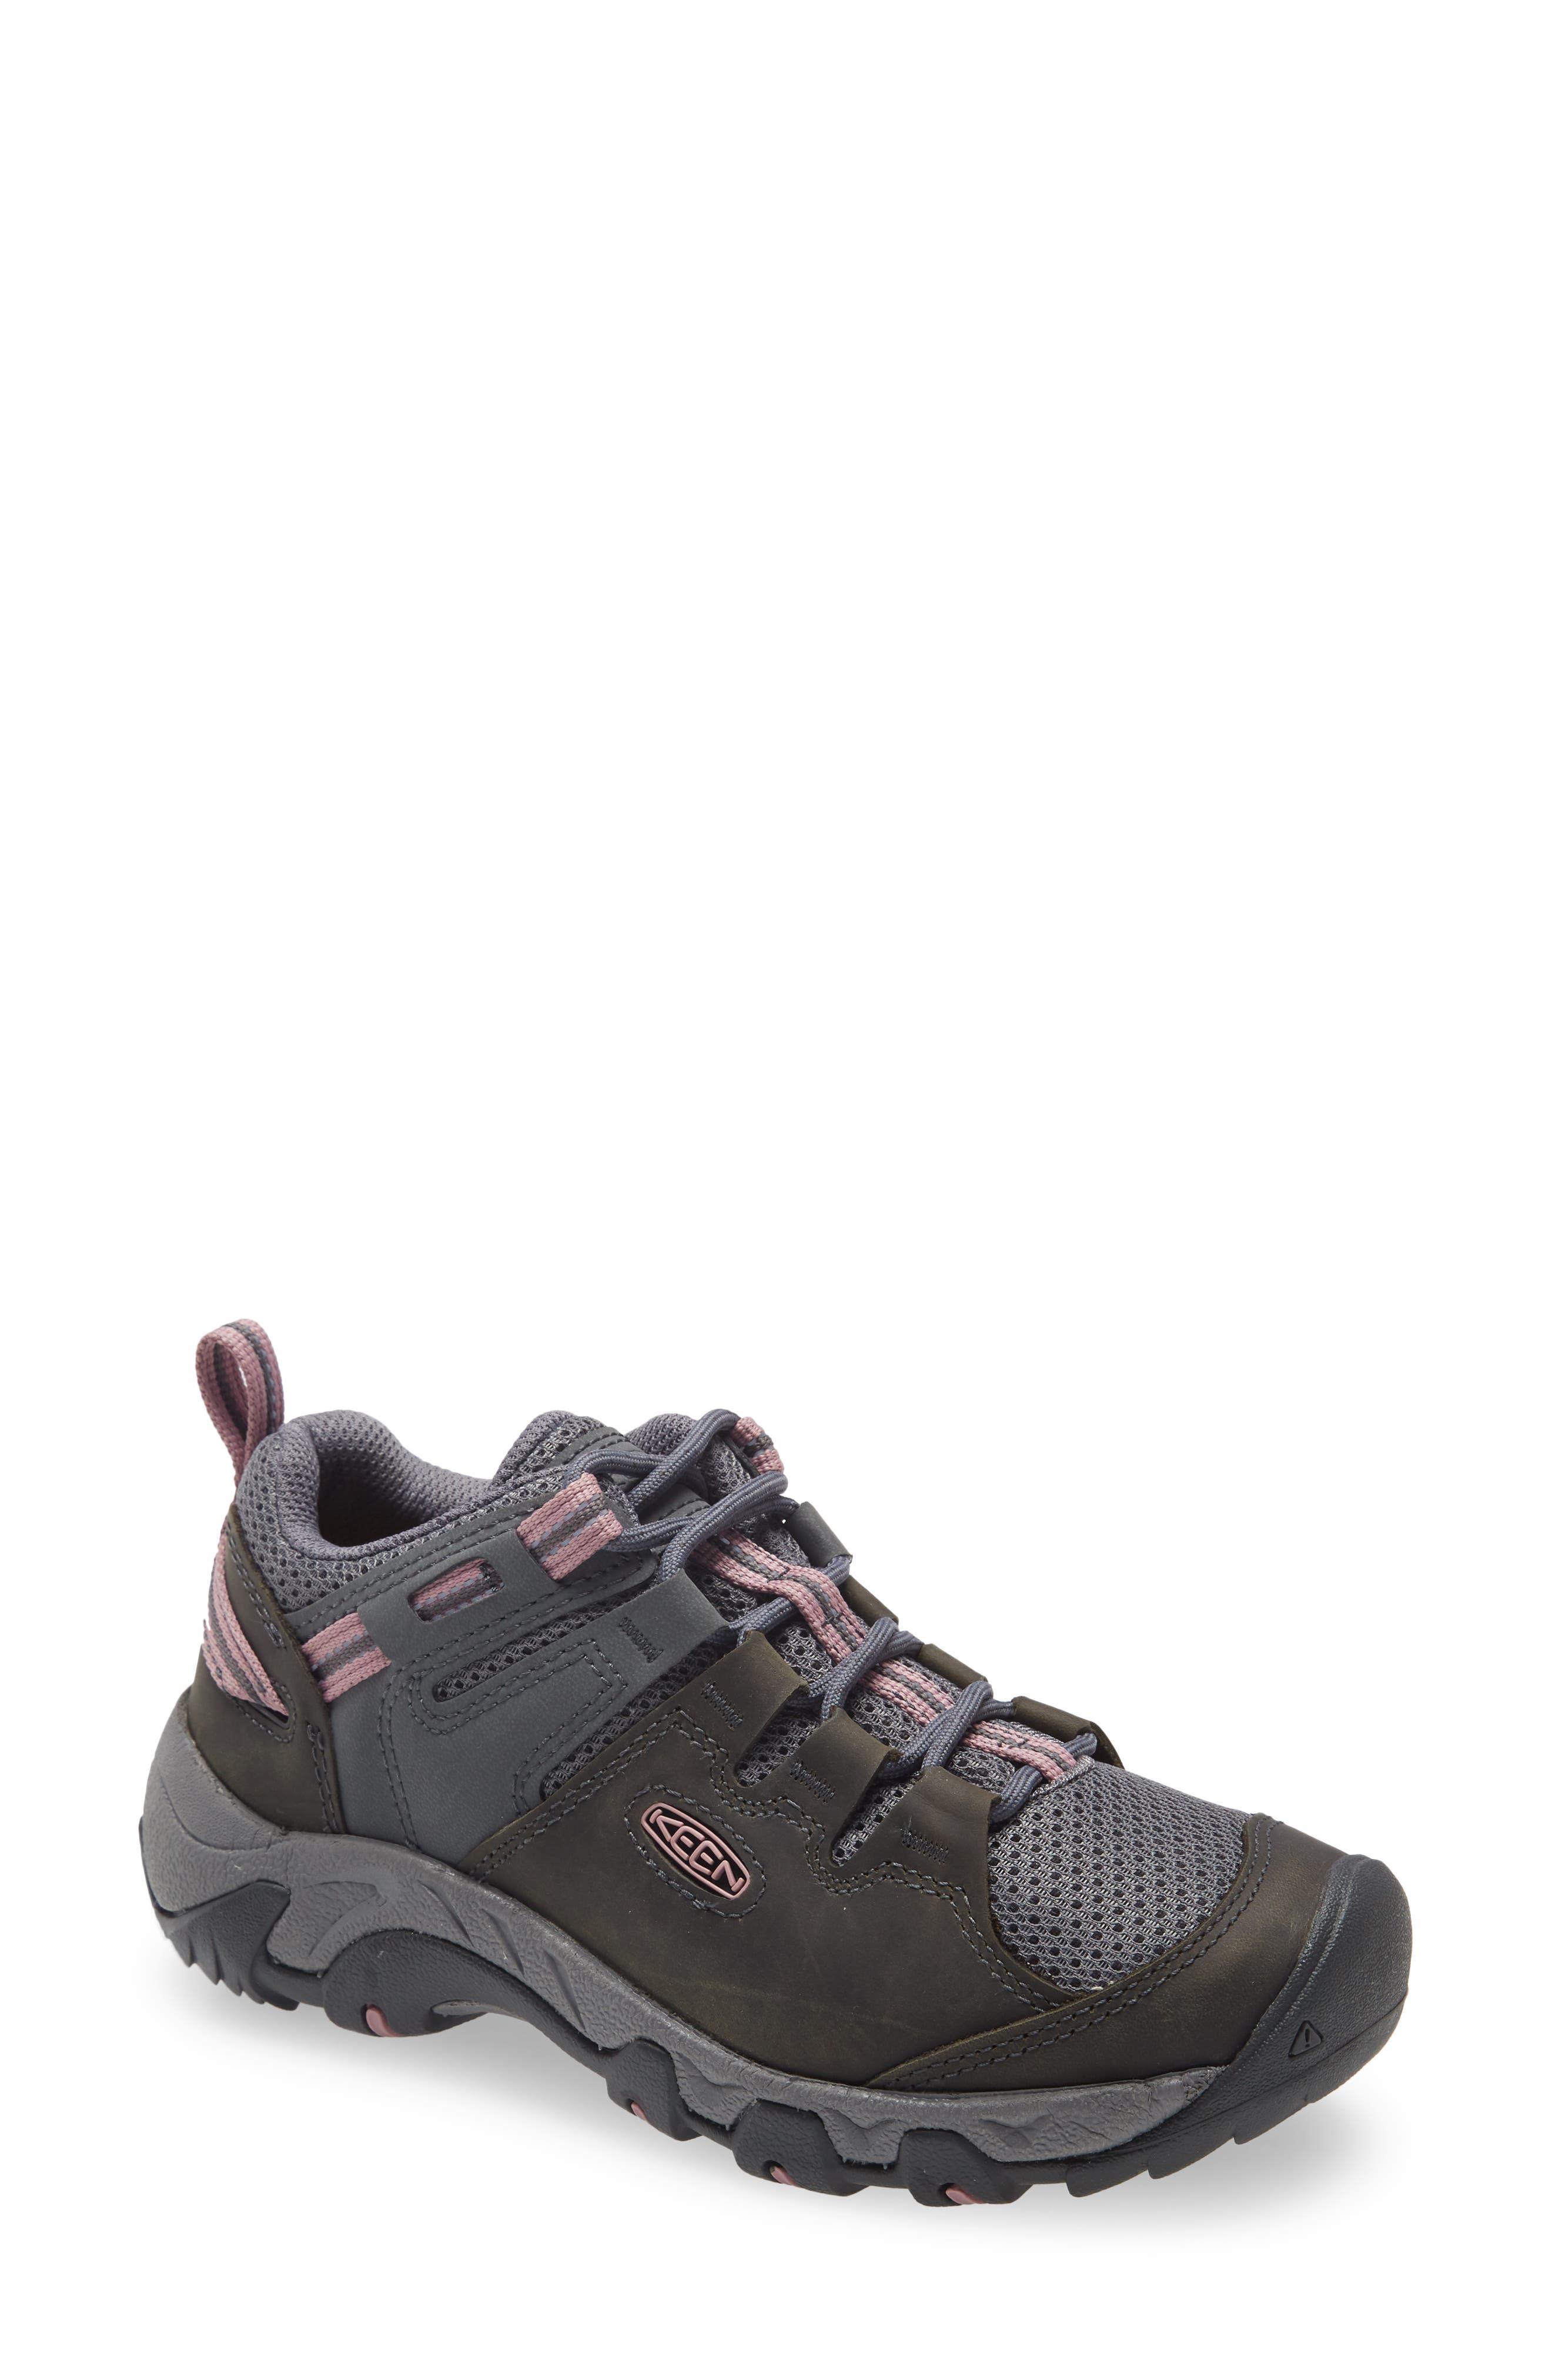 Steens Vent Hiking Shoe